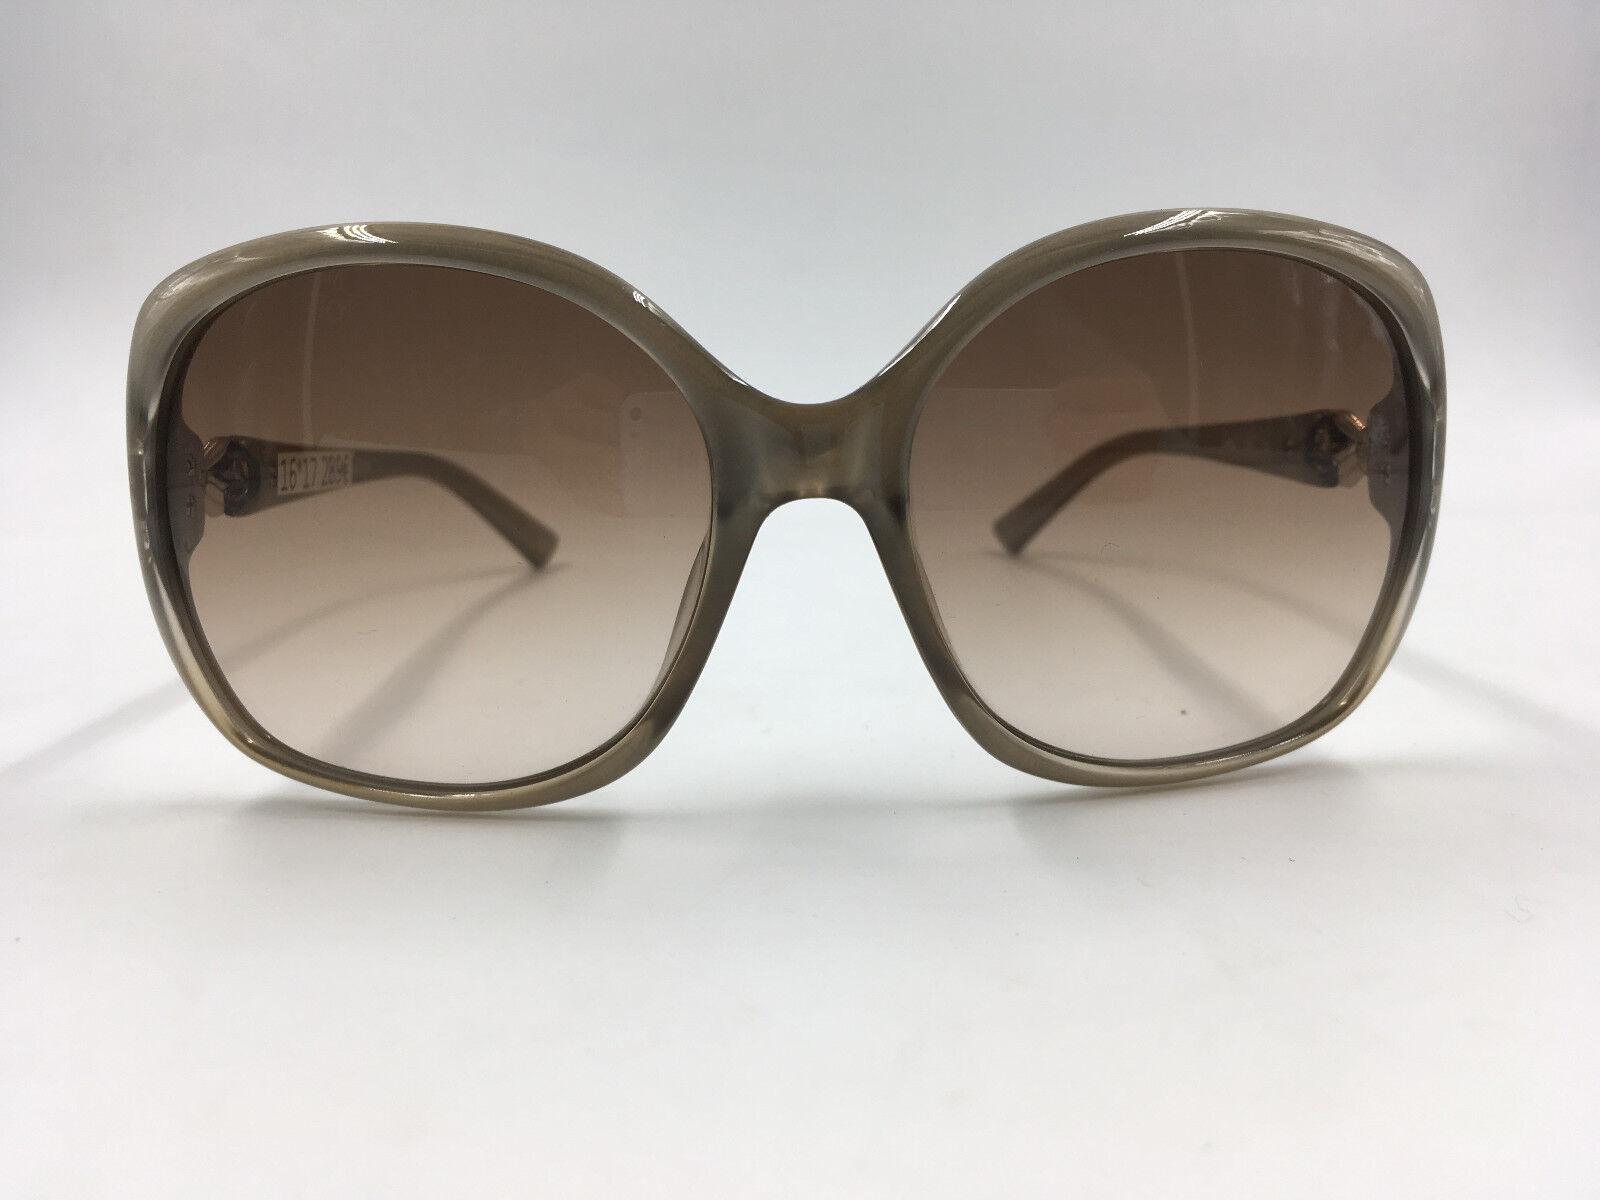 Sonnenbrille     Sonnenbrille valentino V640S 278 125 | Vorzugspreis  b6fea1